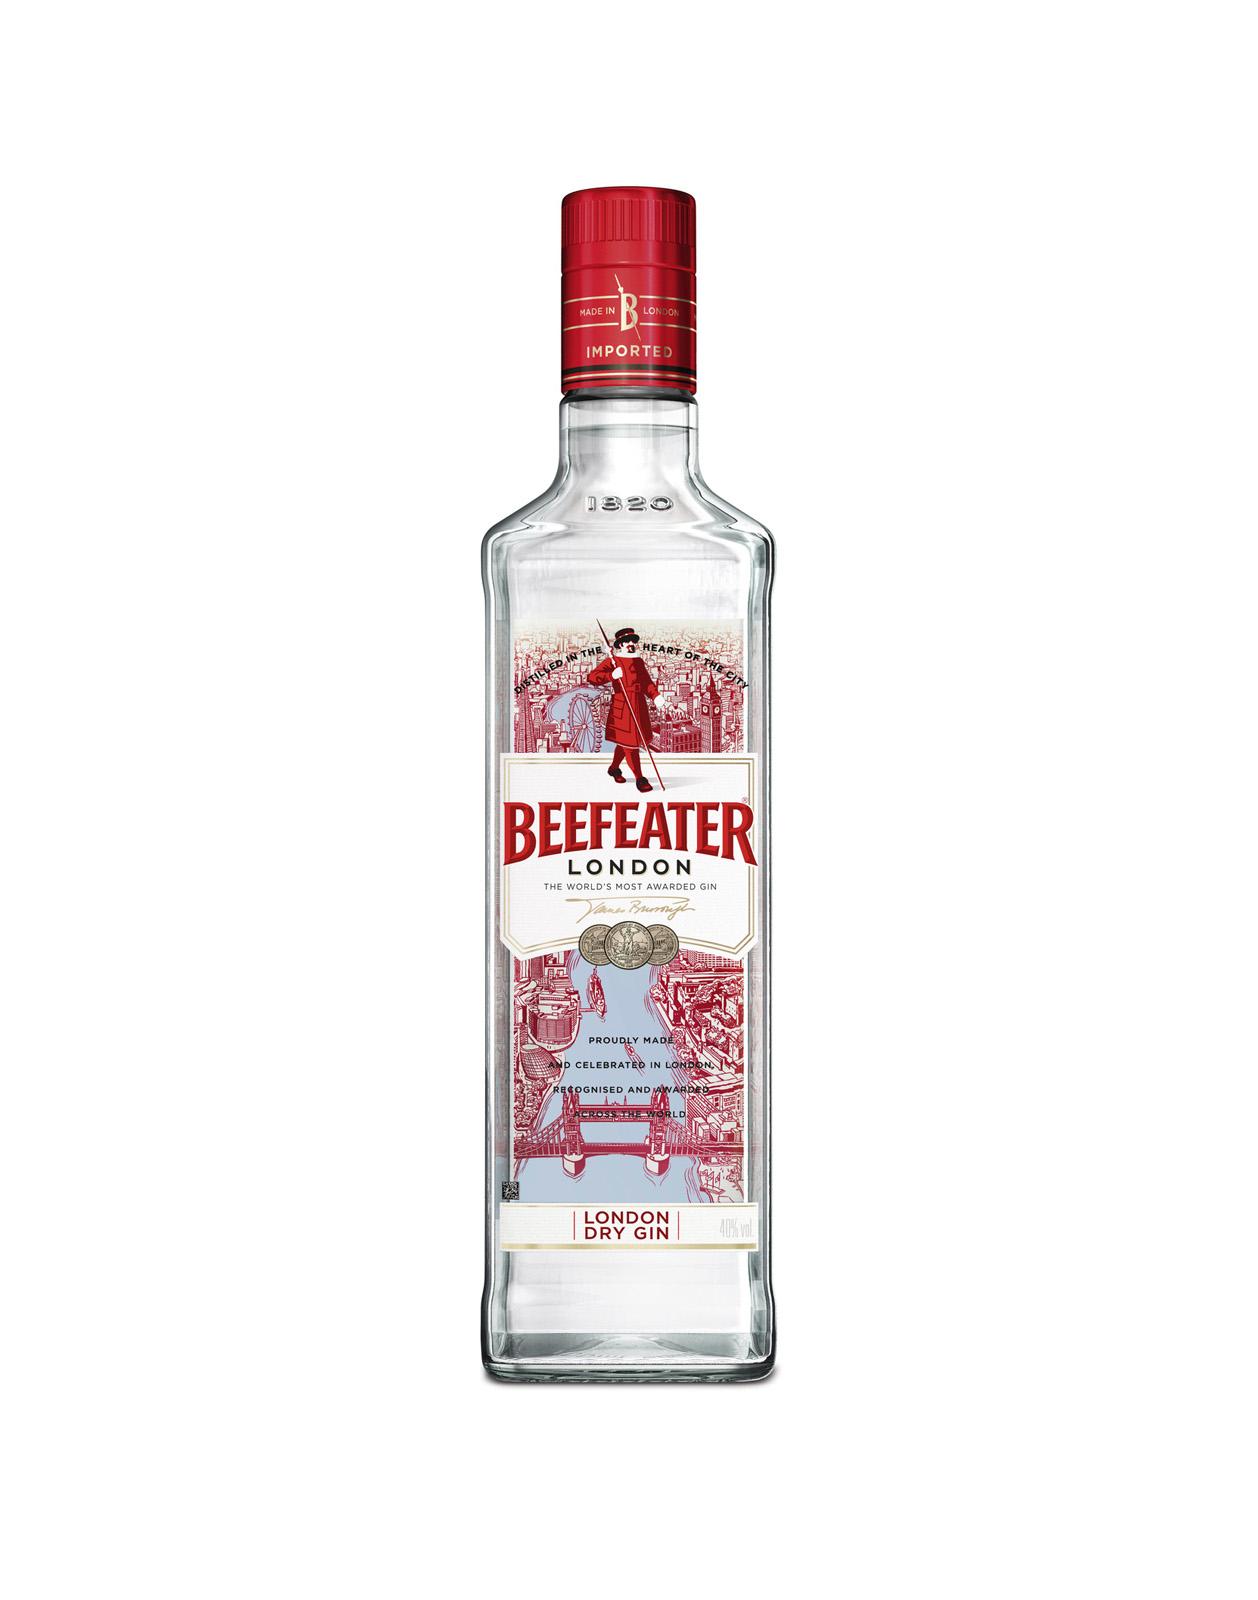 Beefeater Gin 40%, Bottleshop Sunny wines slnecnice mesto, petrzalka, Gin, rozvoz alkoholu, eshop